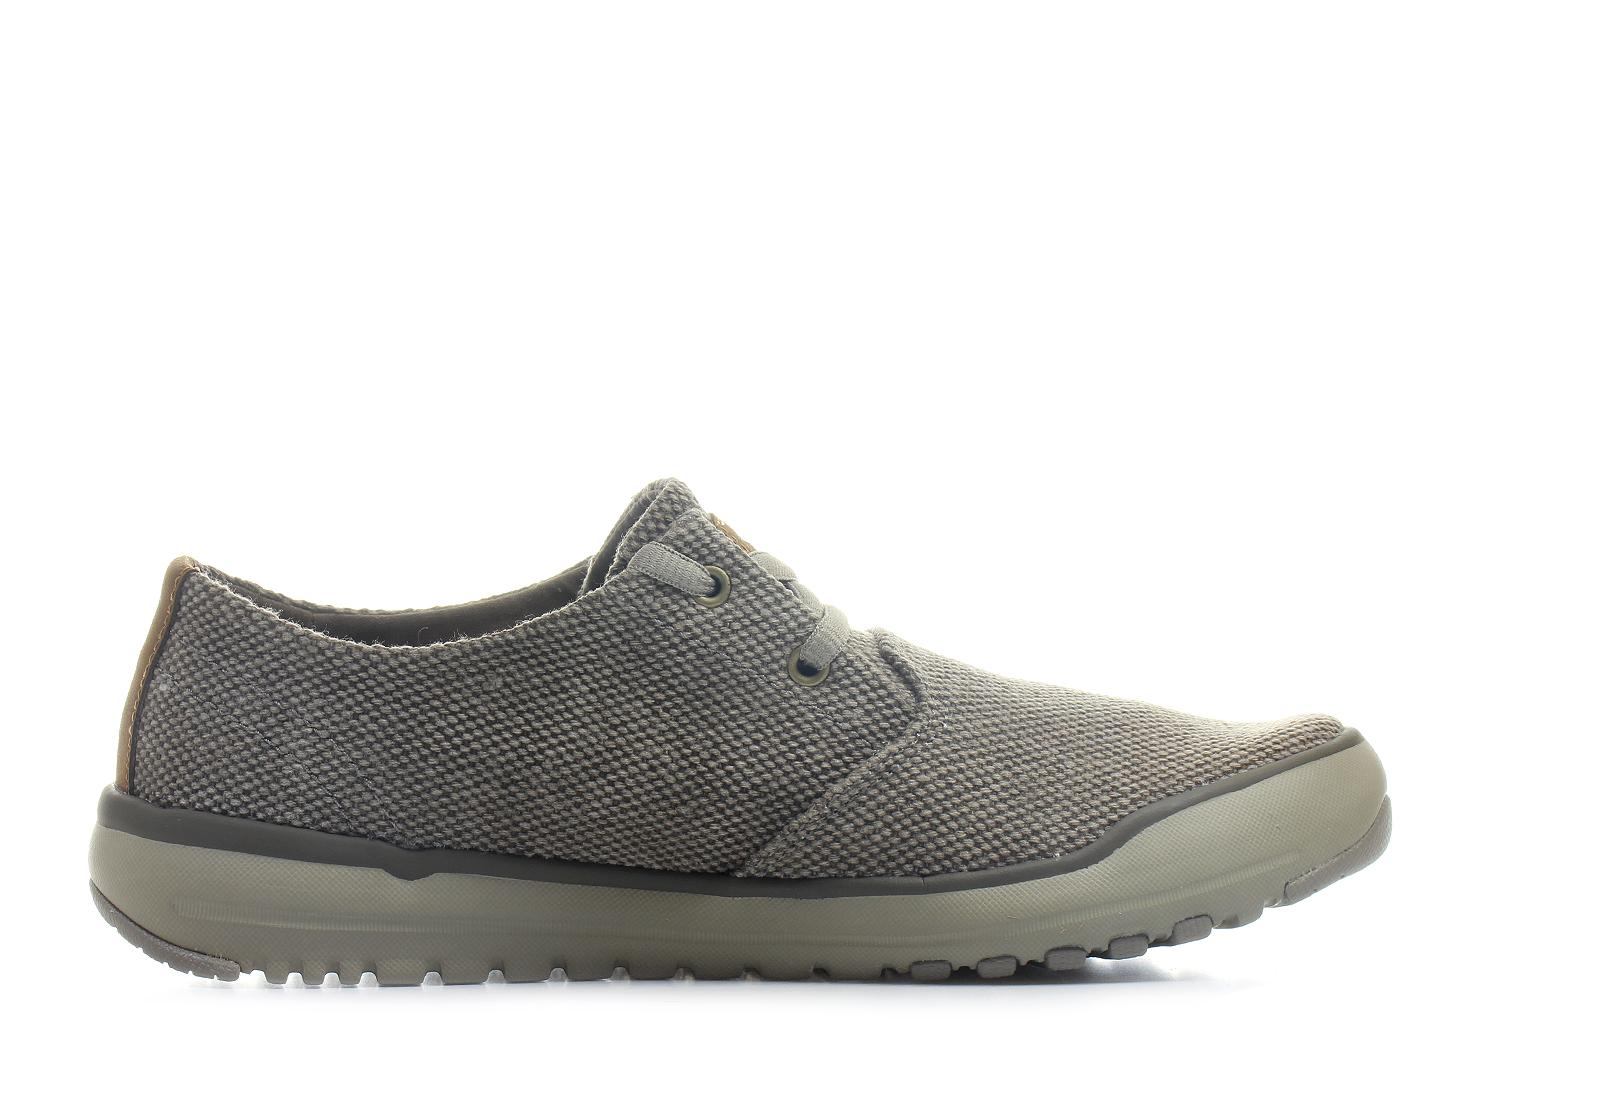 Skechers Cipő - Oldis - Stound - 64622-tpe - Office Shoes Magyarország 6e44c6df05